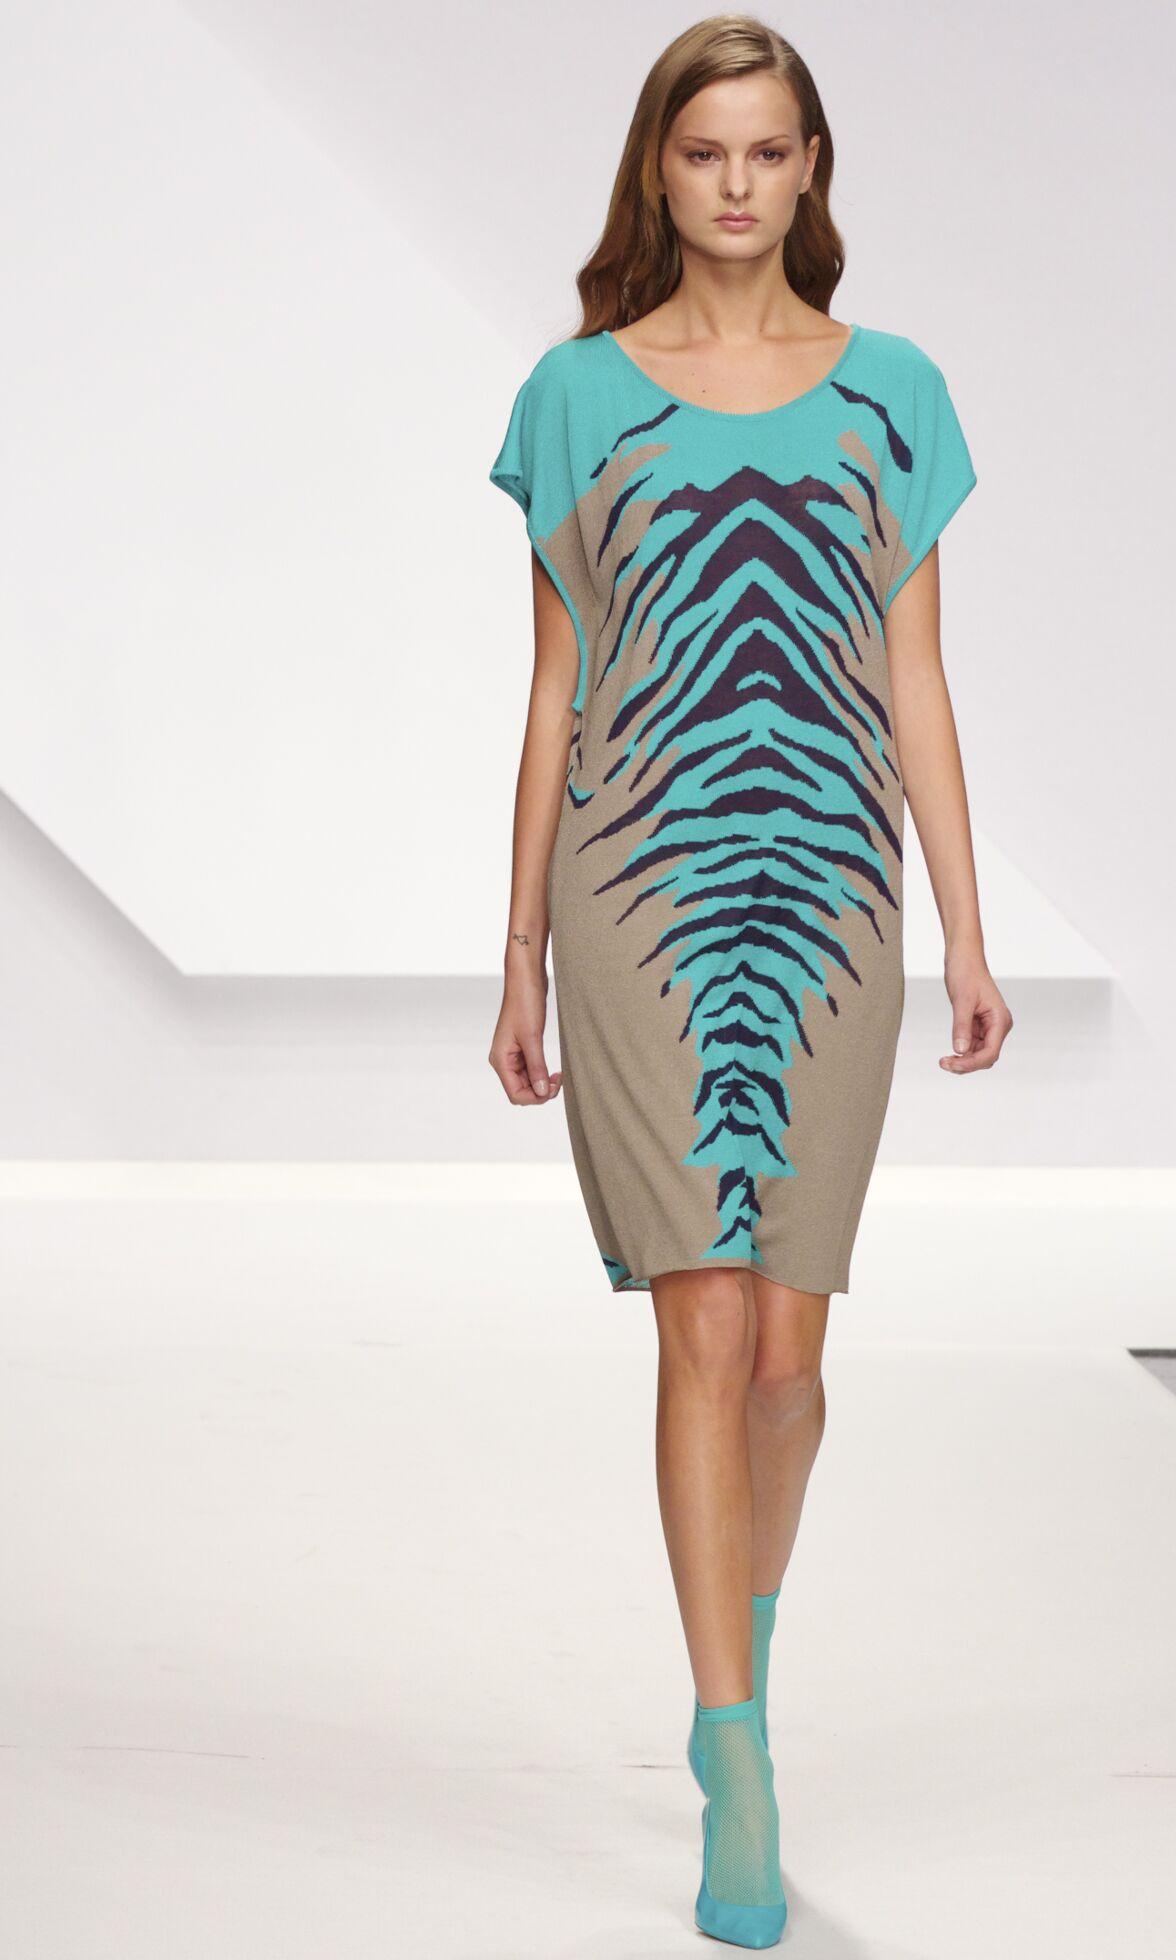 Krizia Milano Fashion Week